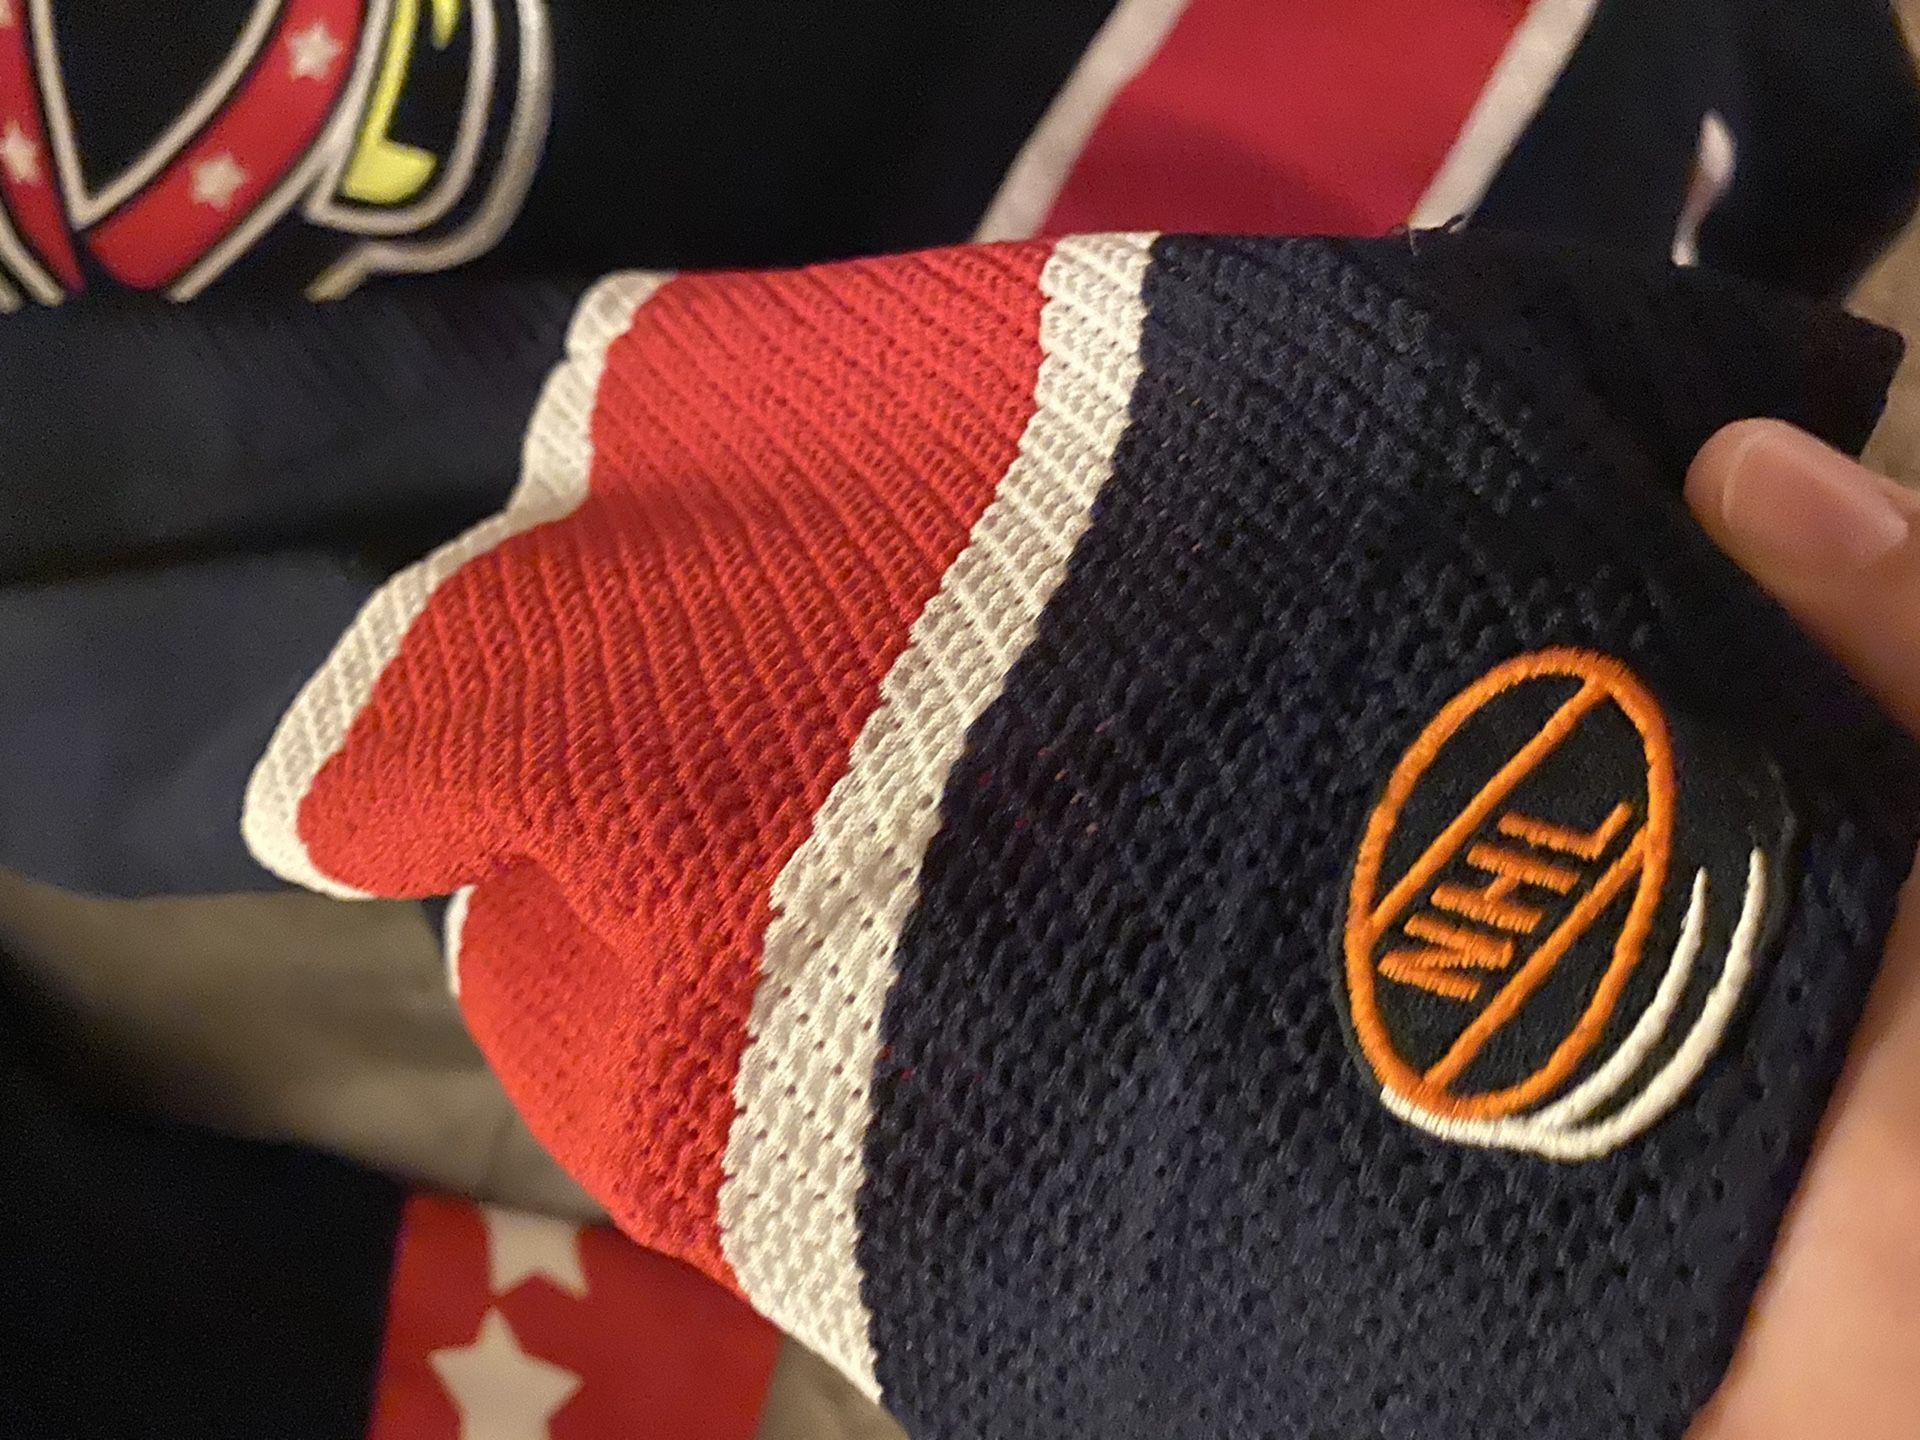 Columbus Blue Jackets jersey, size 2XL